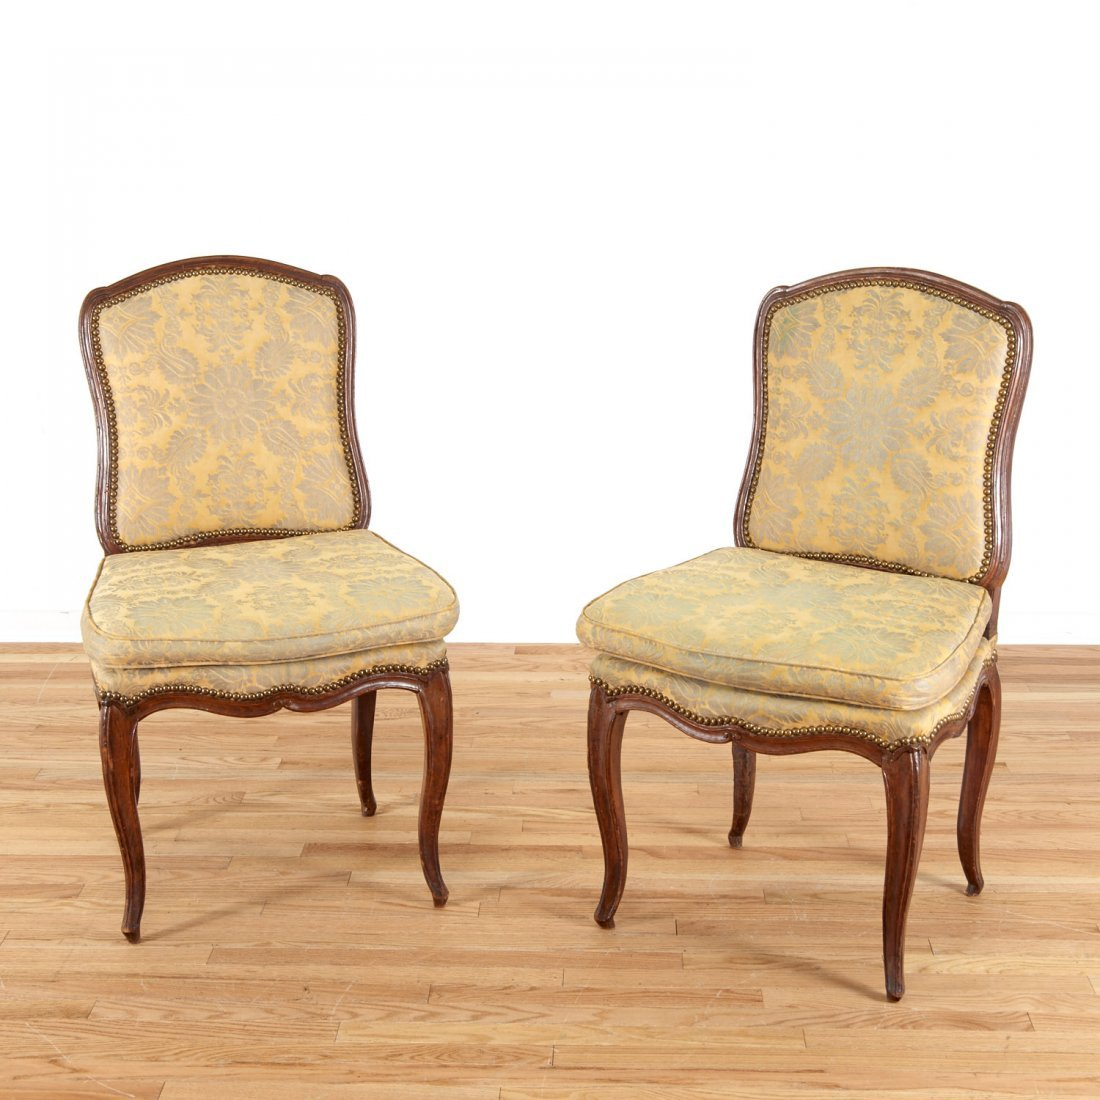 Pair Italian Provincial walnut side chairs